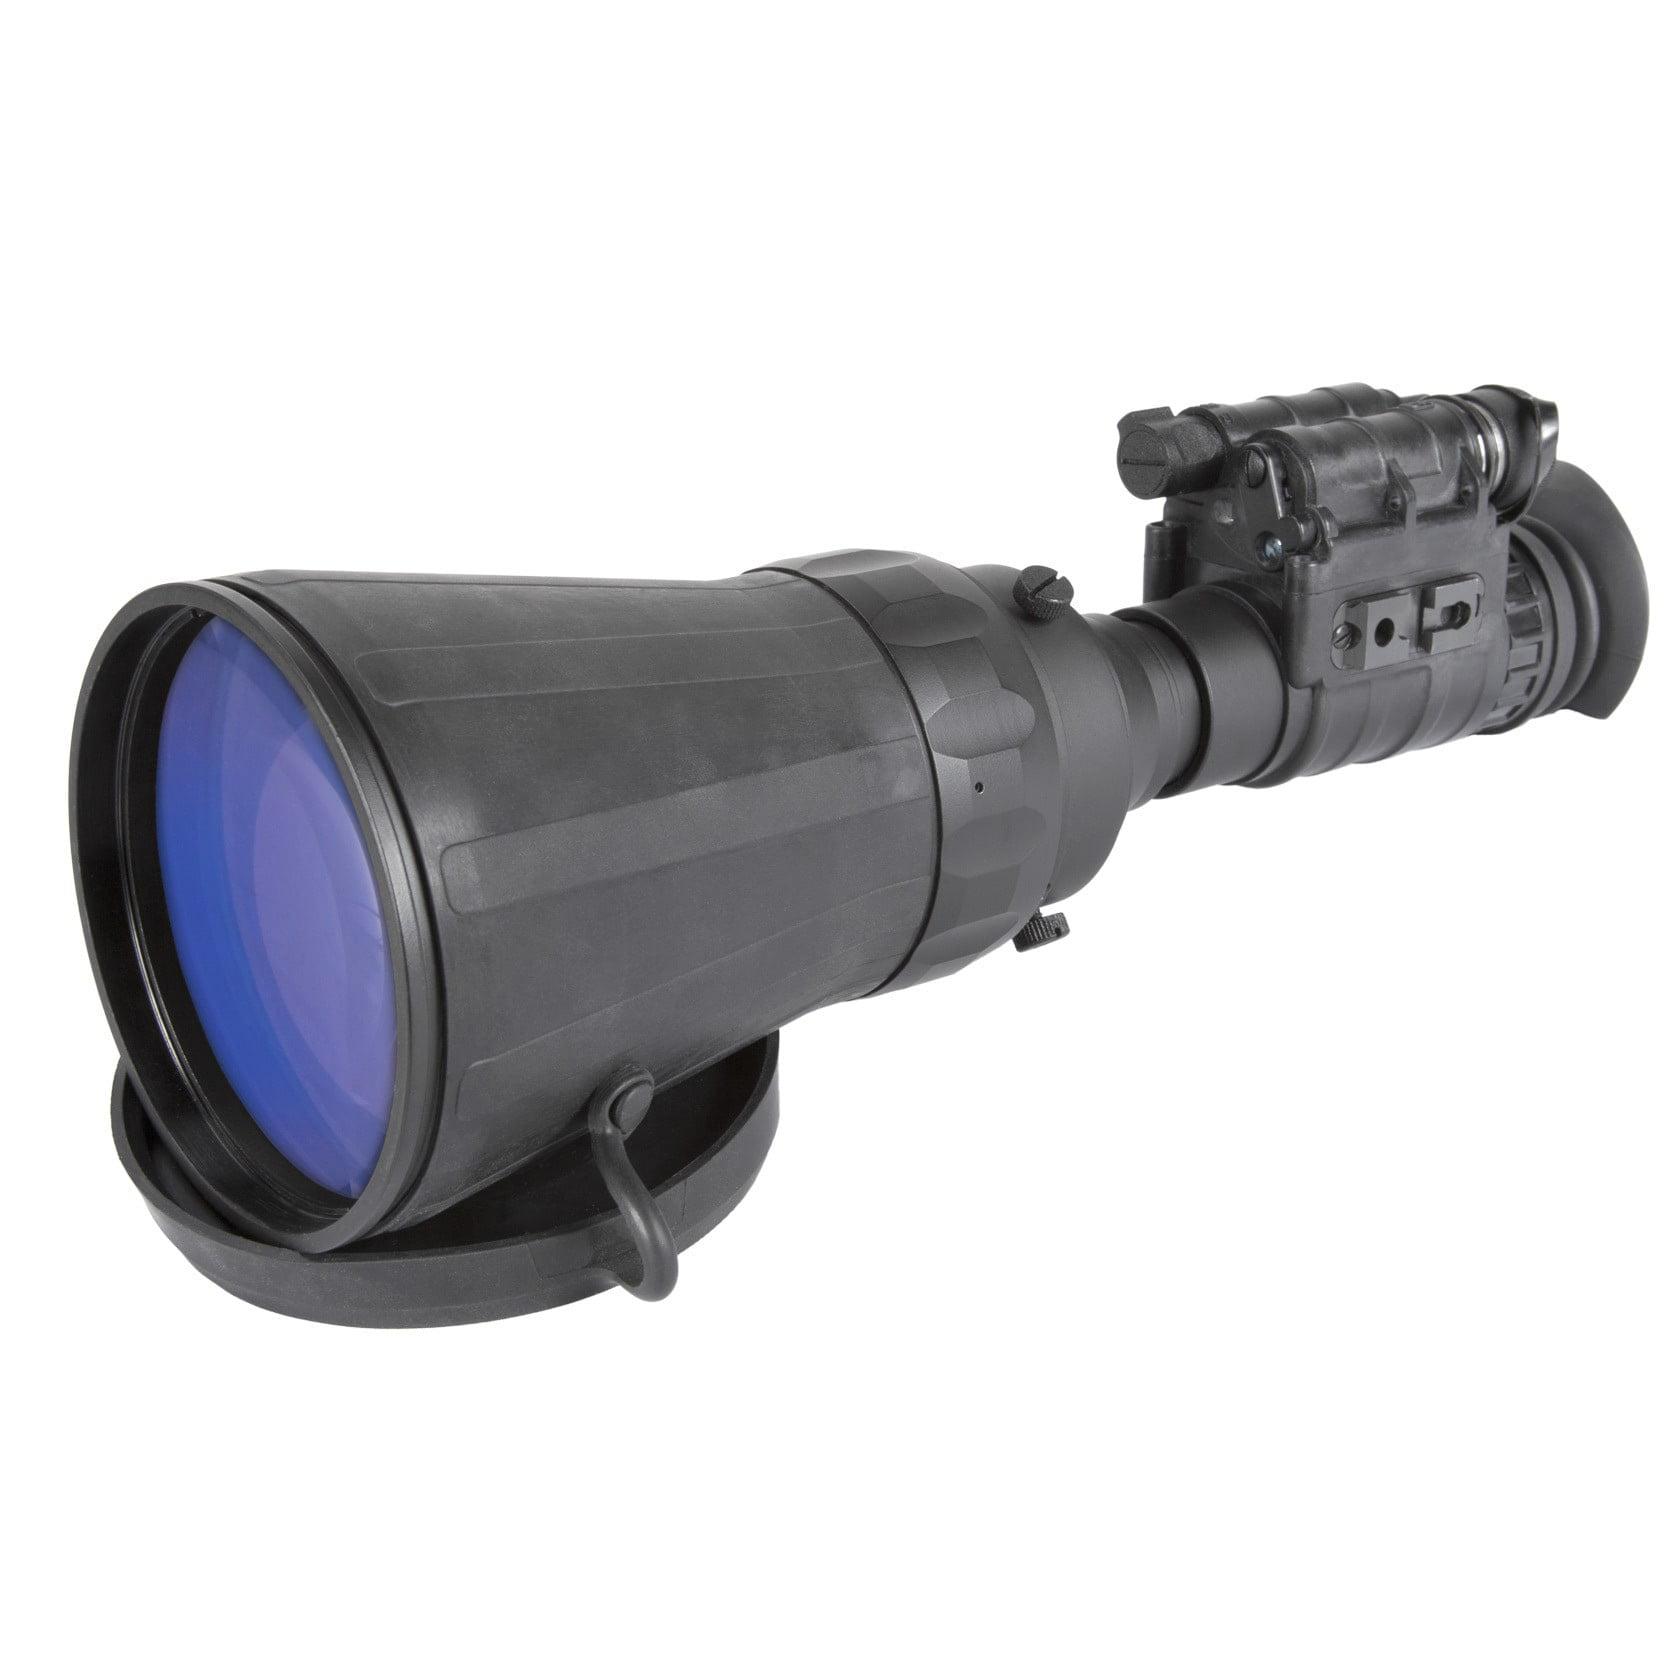 Armasight Avenger 10X HD MG Gen 2+ LR Night Vision Monocular High Definition with XLR-IR850 Illuminator by Armasight